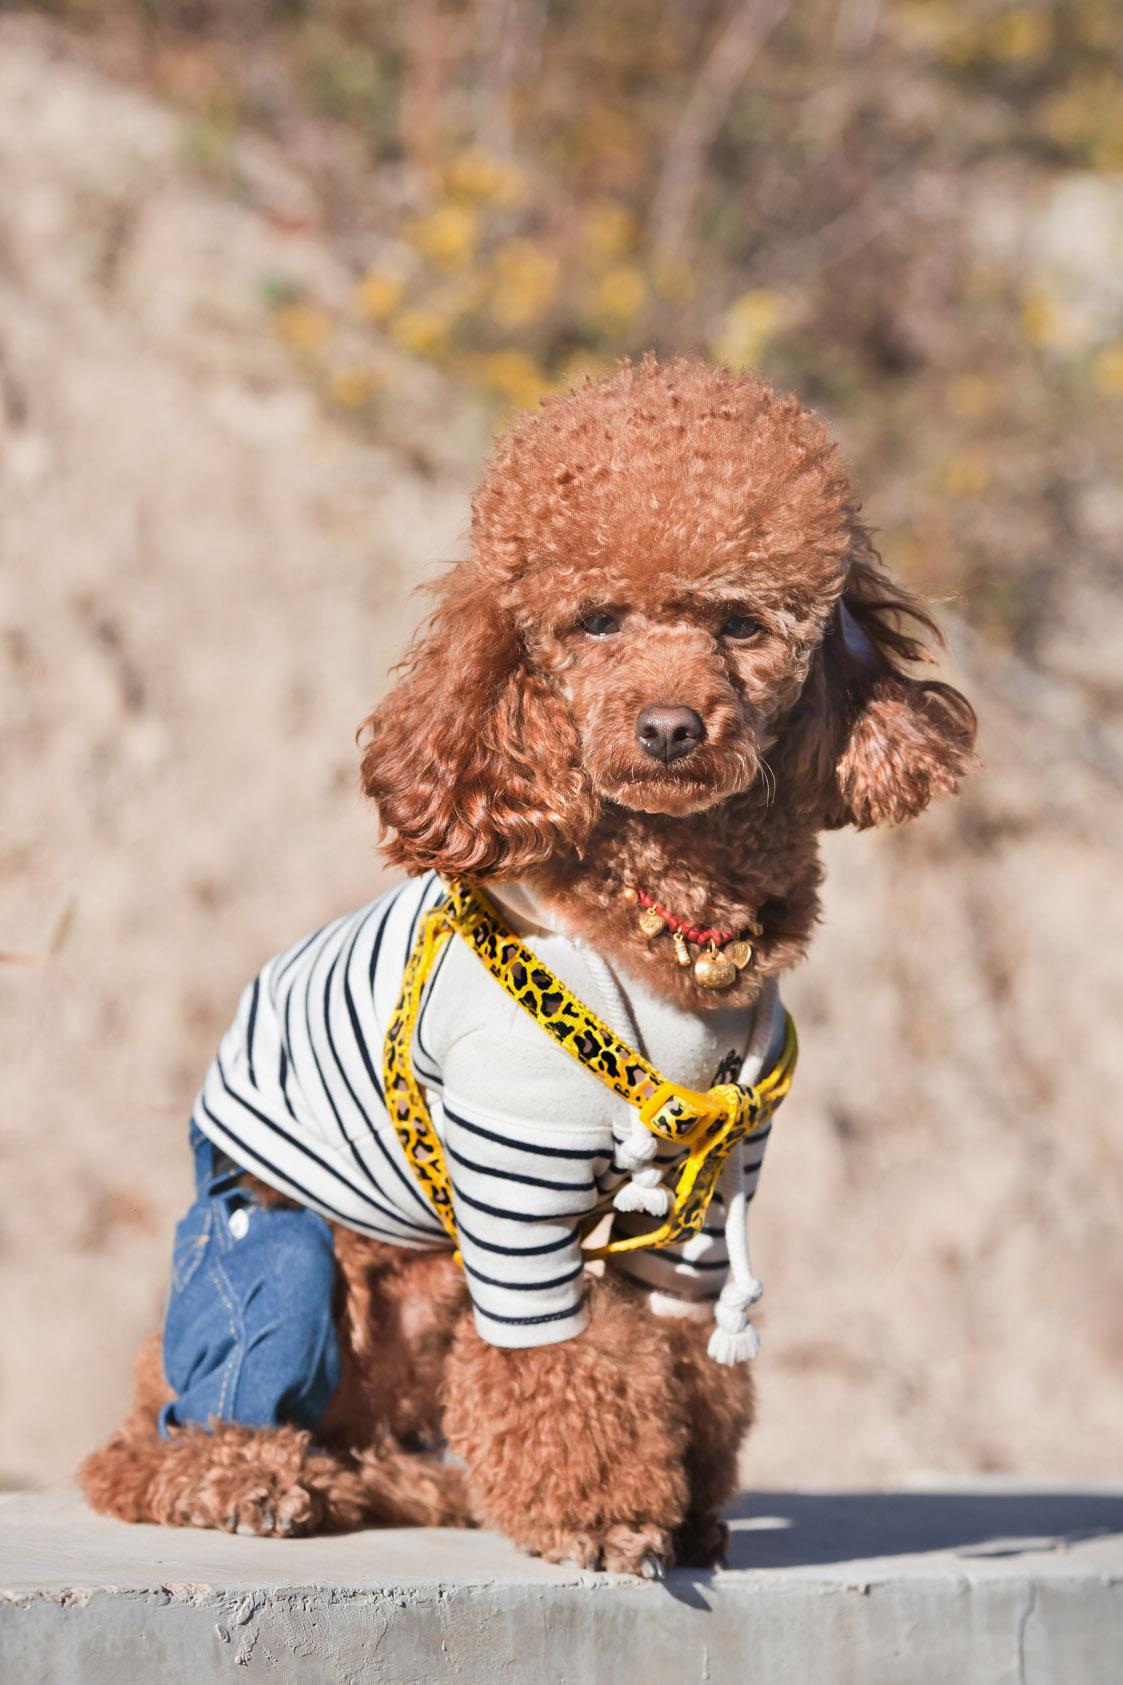 Vooral hondjes worden erg ludiek aangekleed